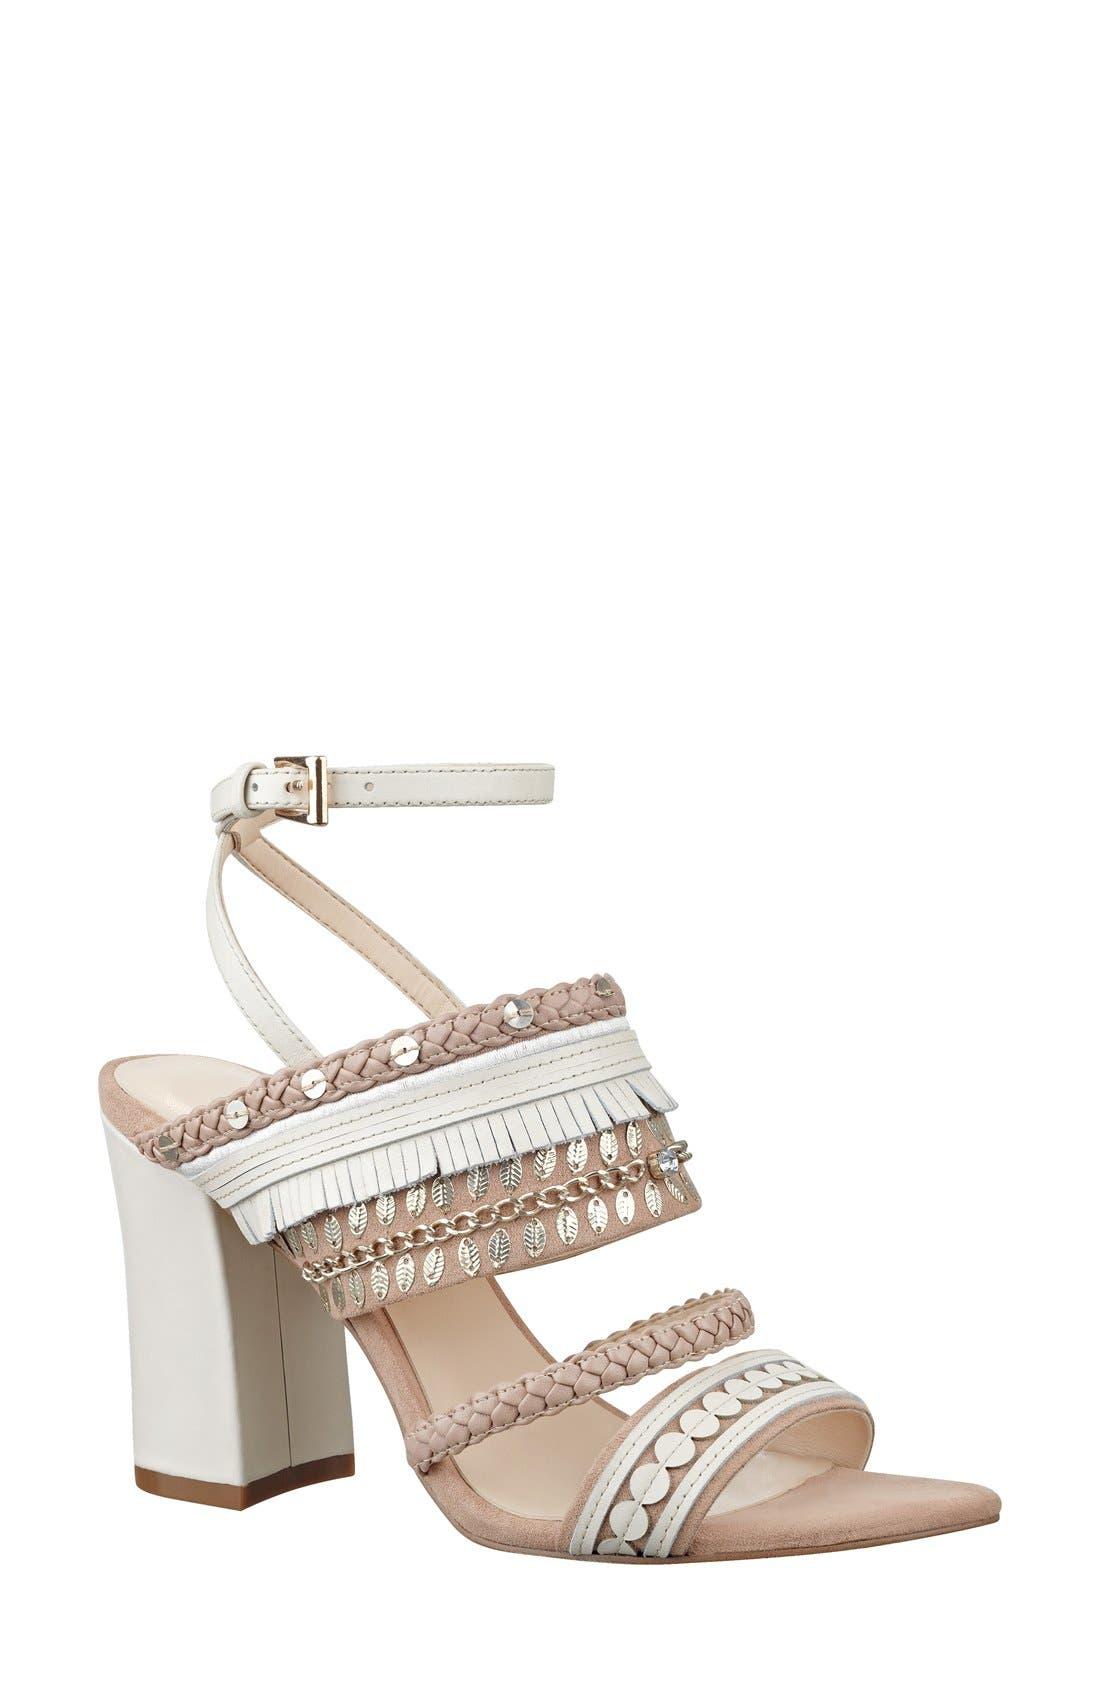 Main Image - Nine West 'Baebee' Block Heel Sandal (Women)